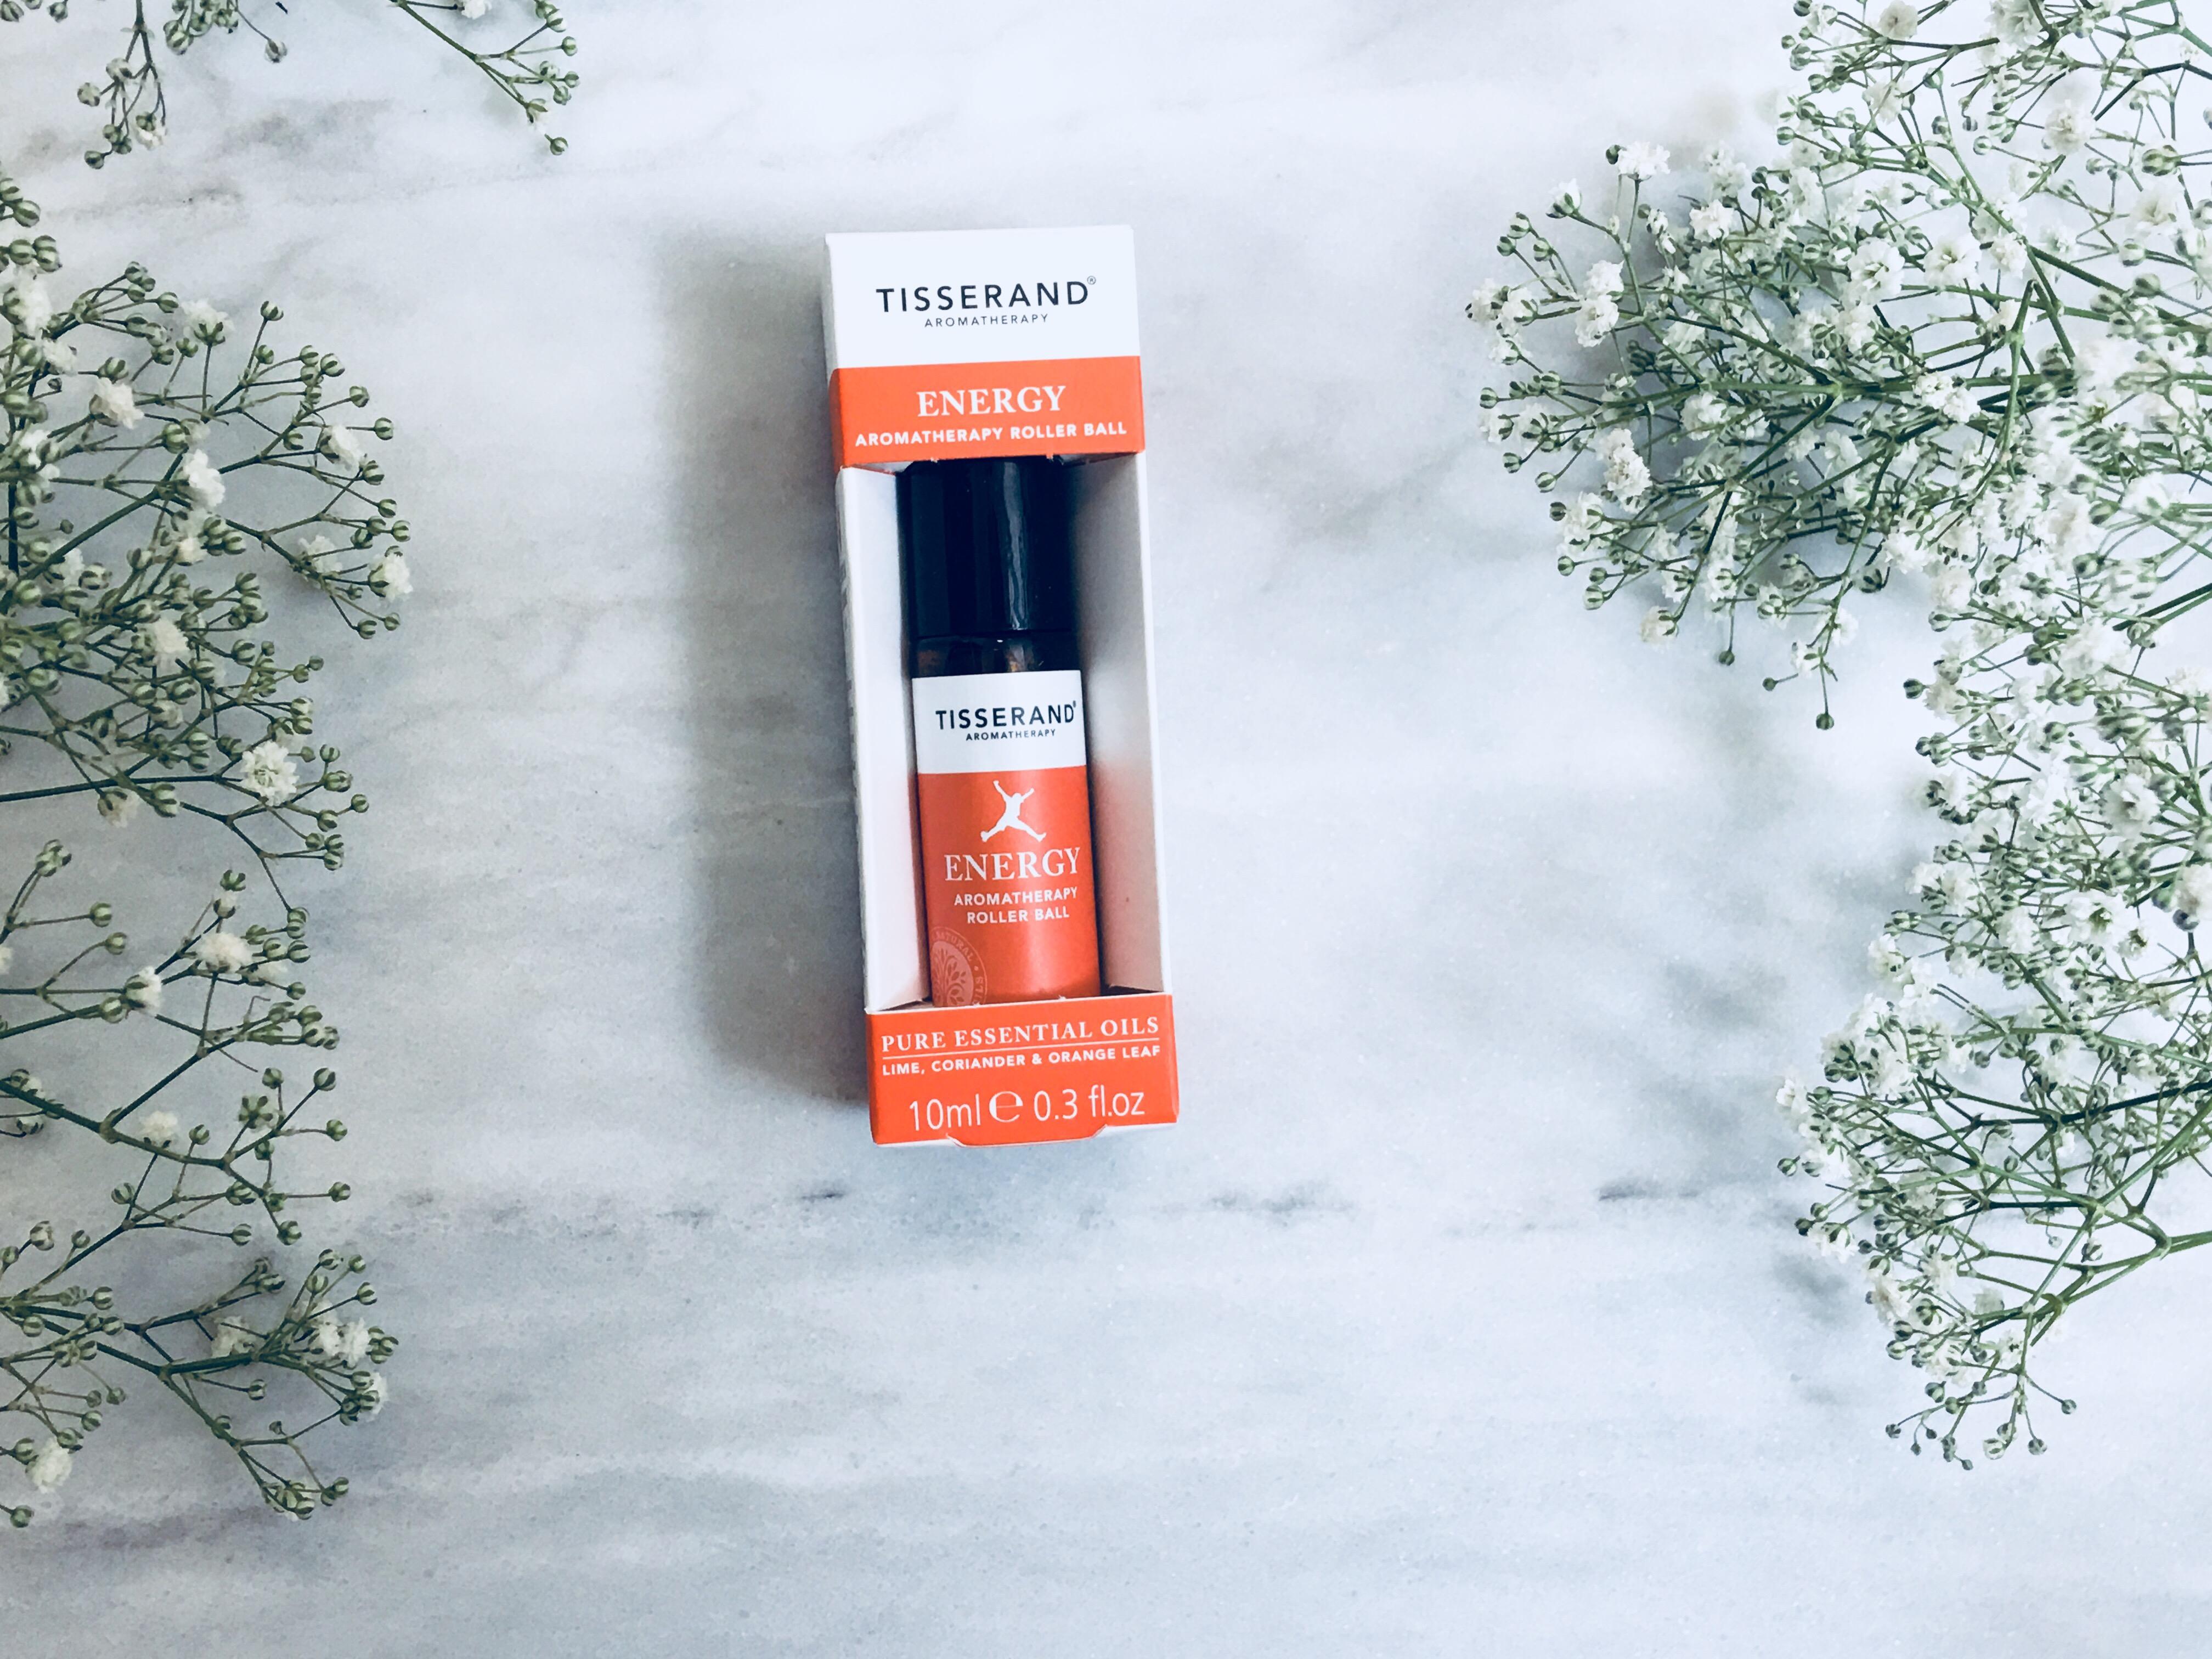 Tisserand energy aromatherapy roller ball